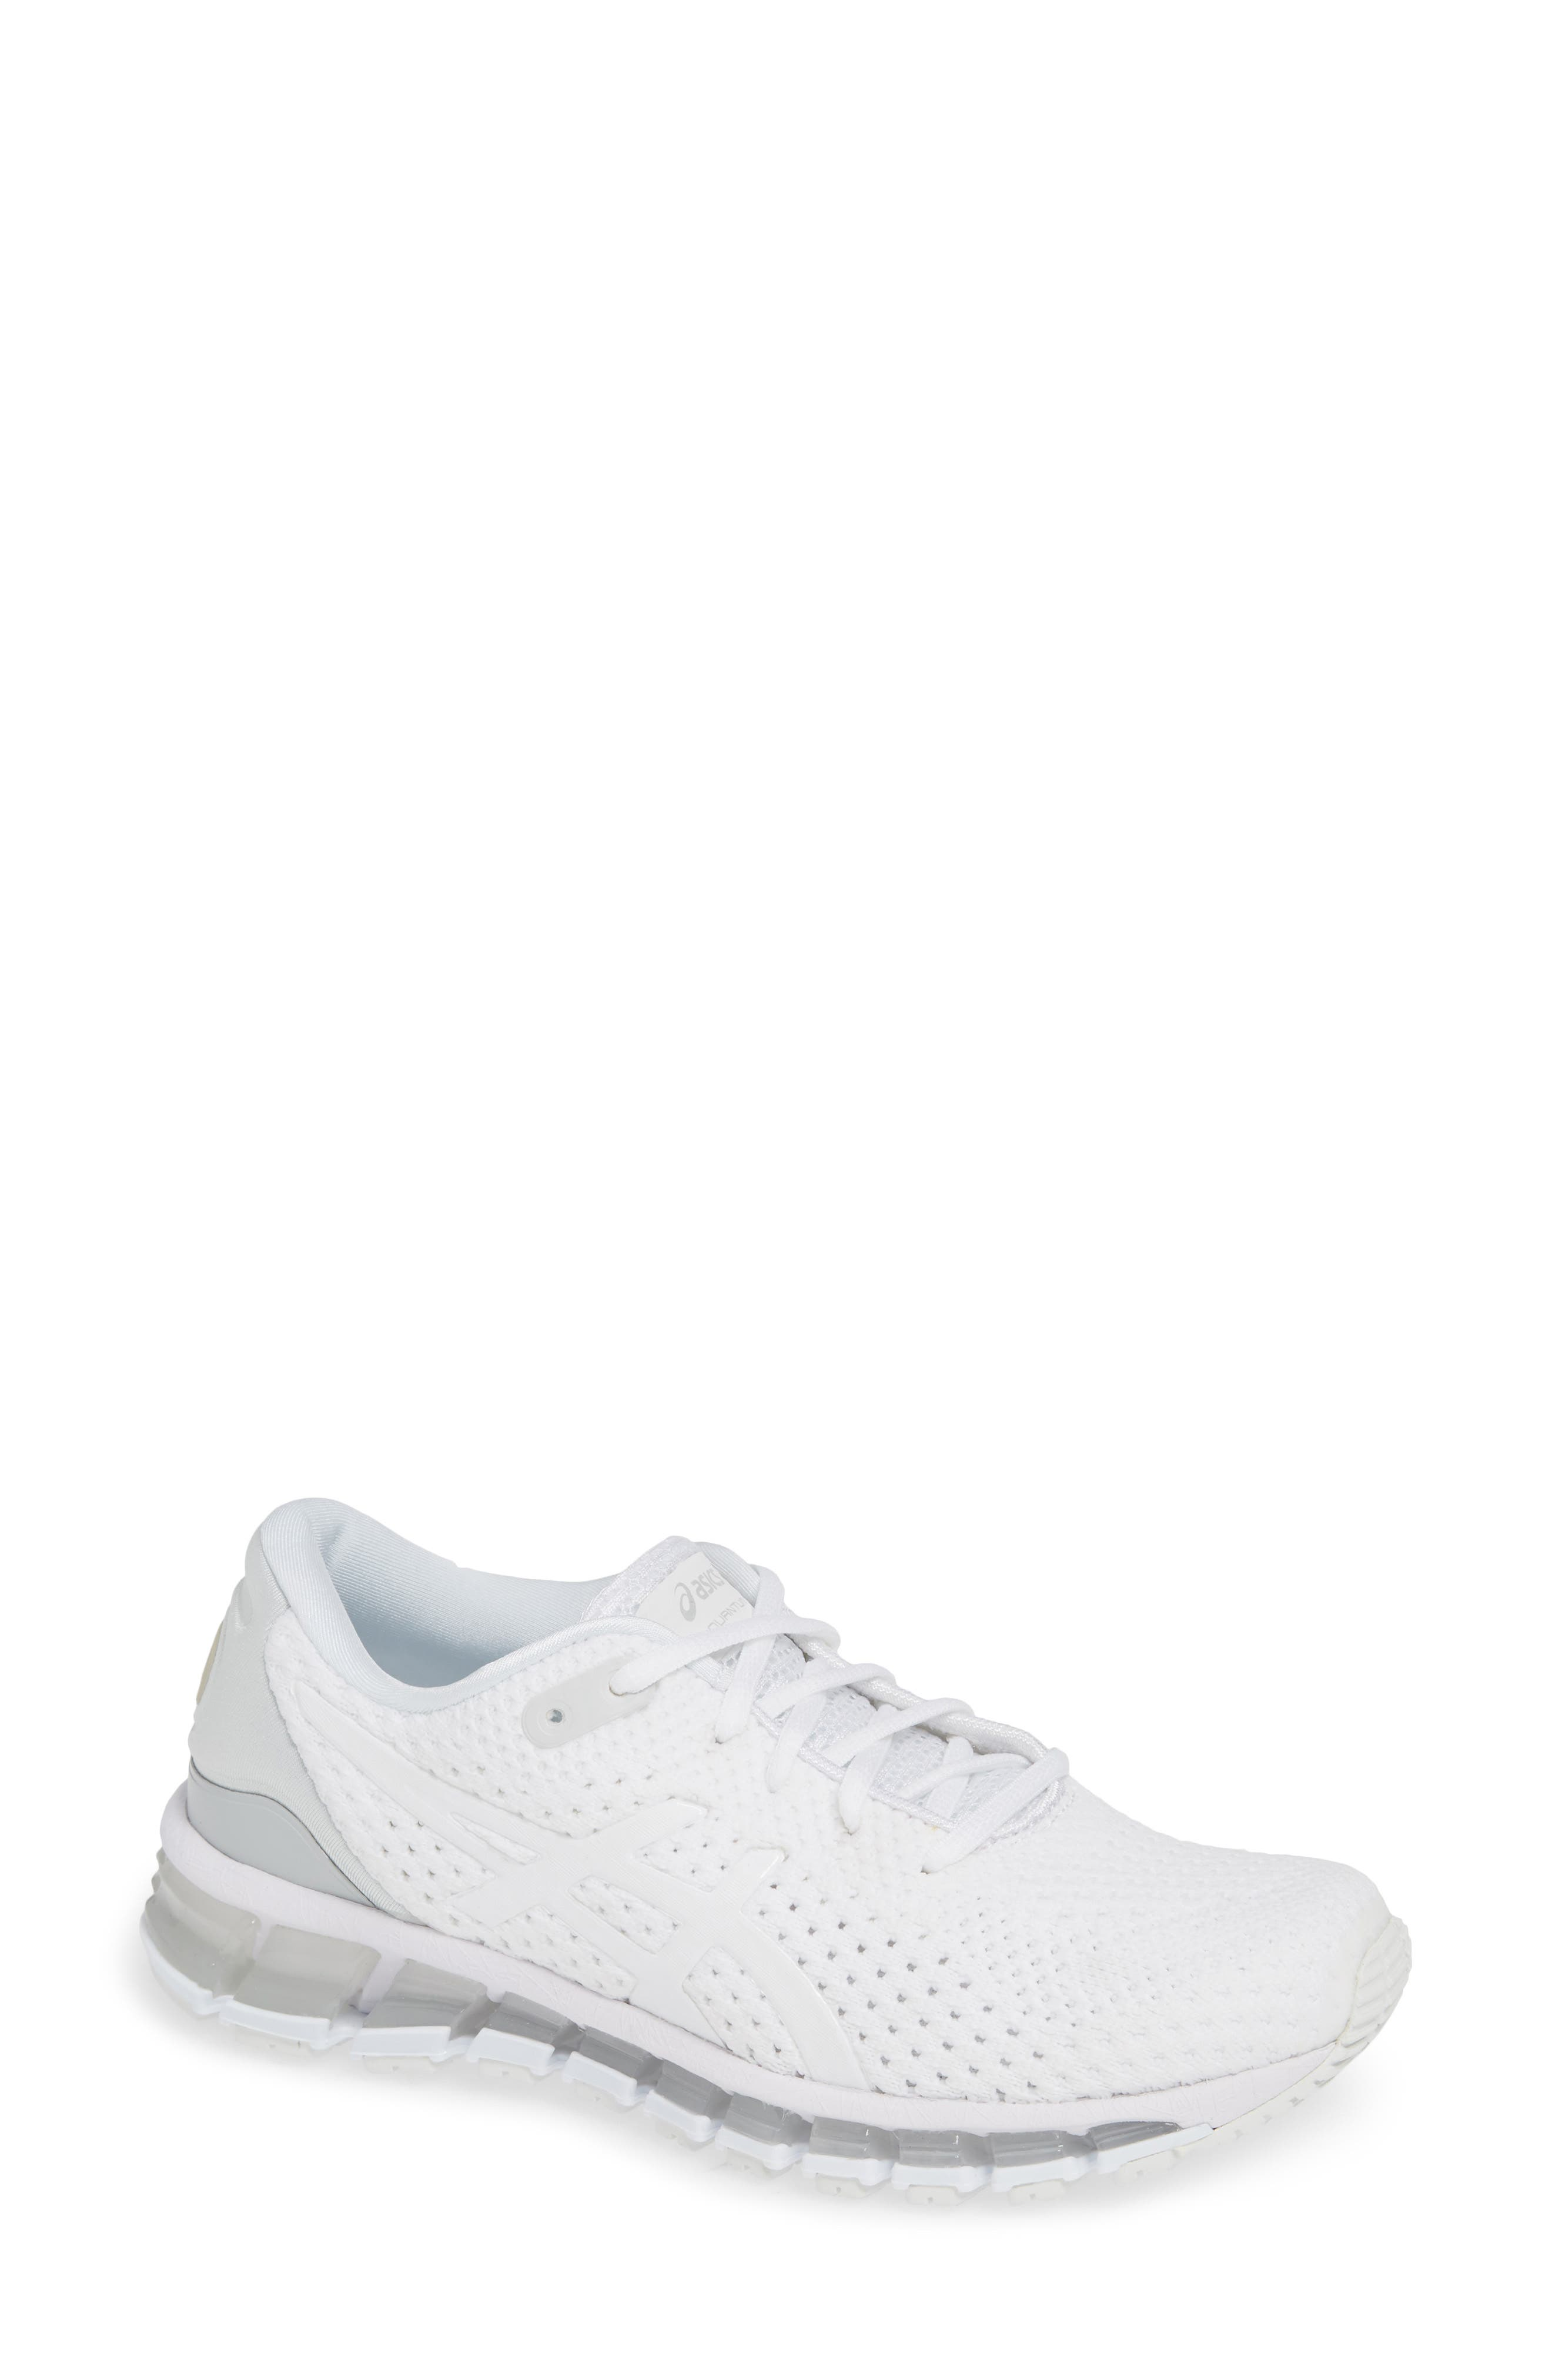 Asics Gel-Quantum 360 Running Shoe B - White